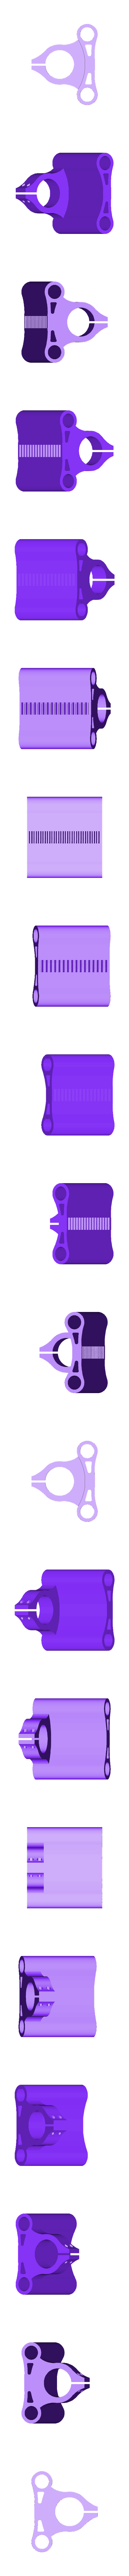 MAIN_GUIDE.stl Download free STL file COLUMN DRILL • Design to 3D print, Pipapelaa